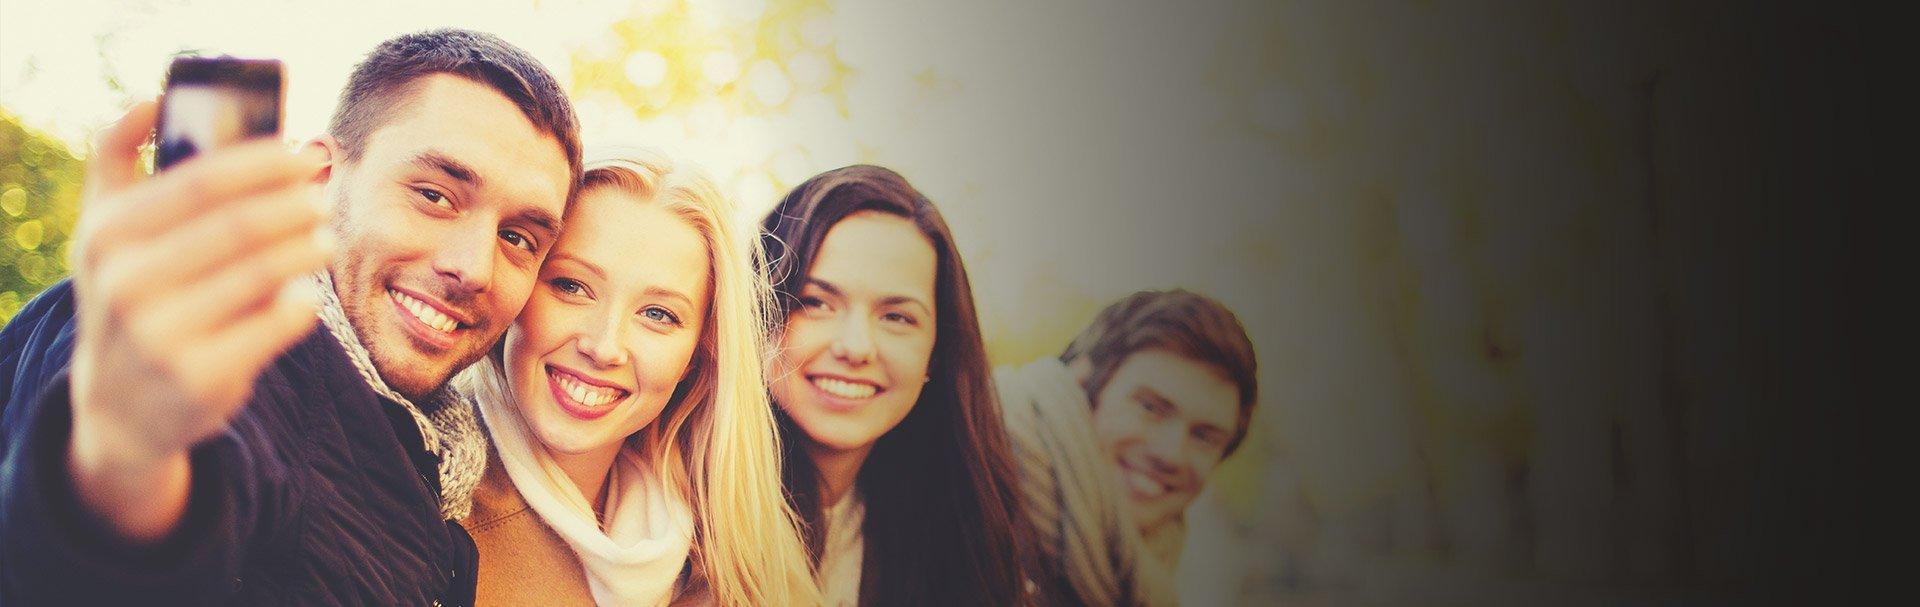 our smiles